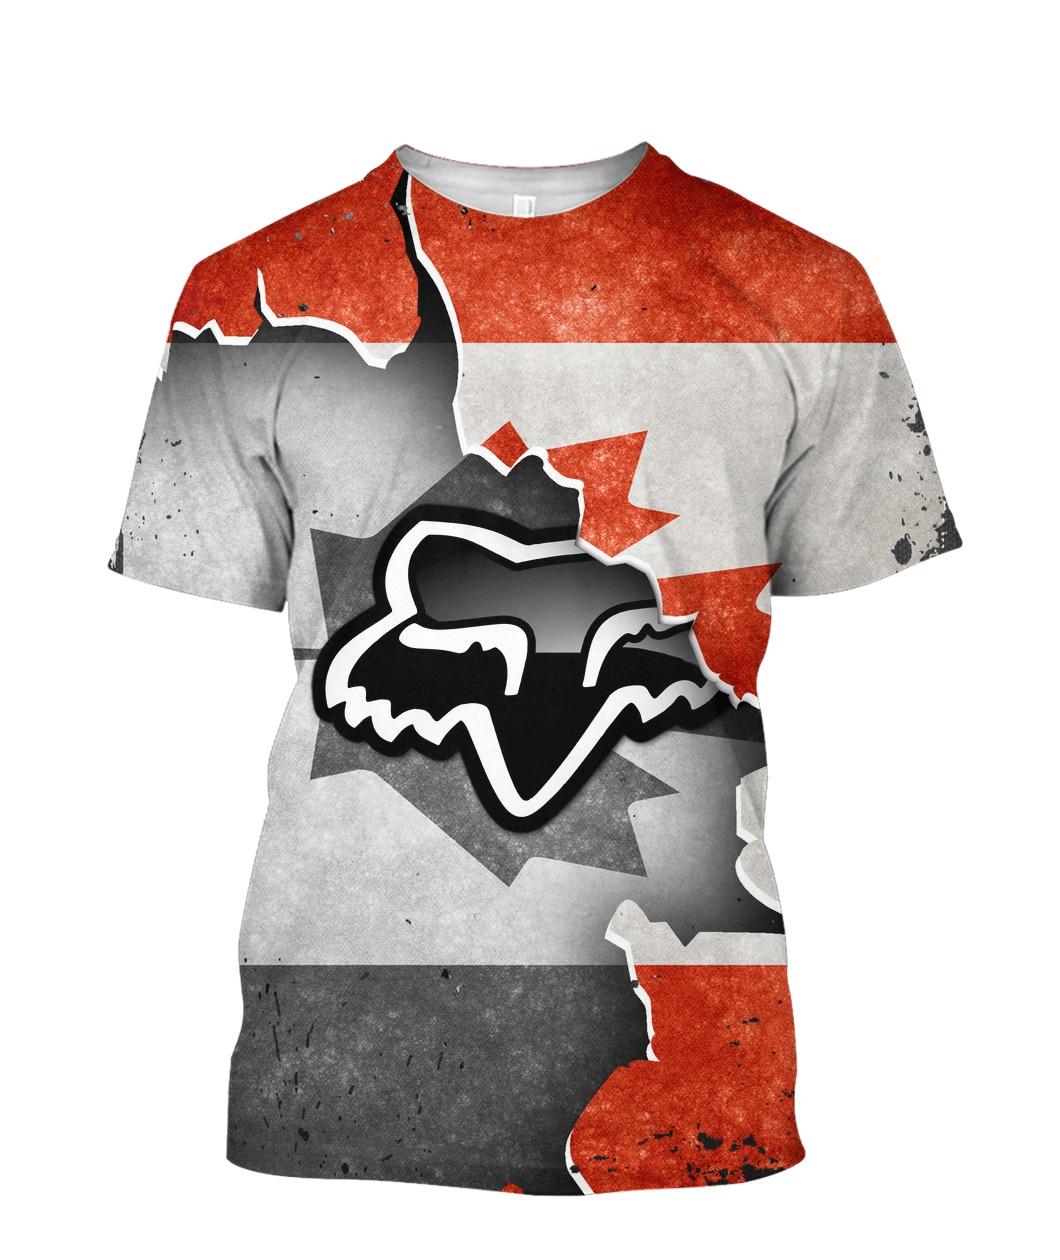 Fox racing in canada flag full printing tshirt